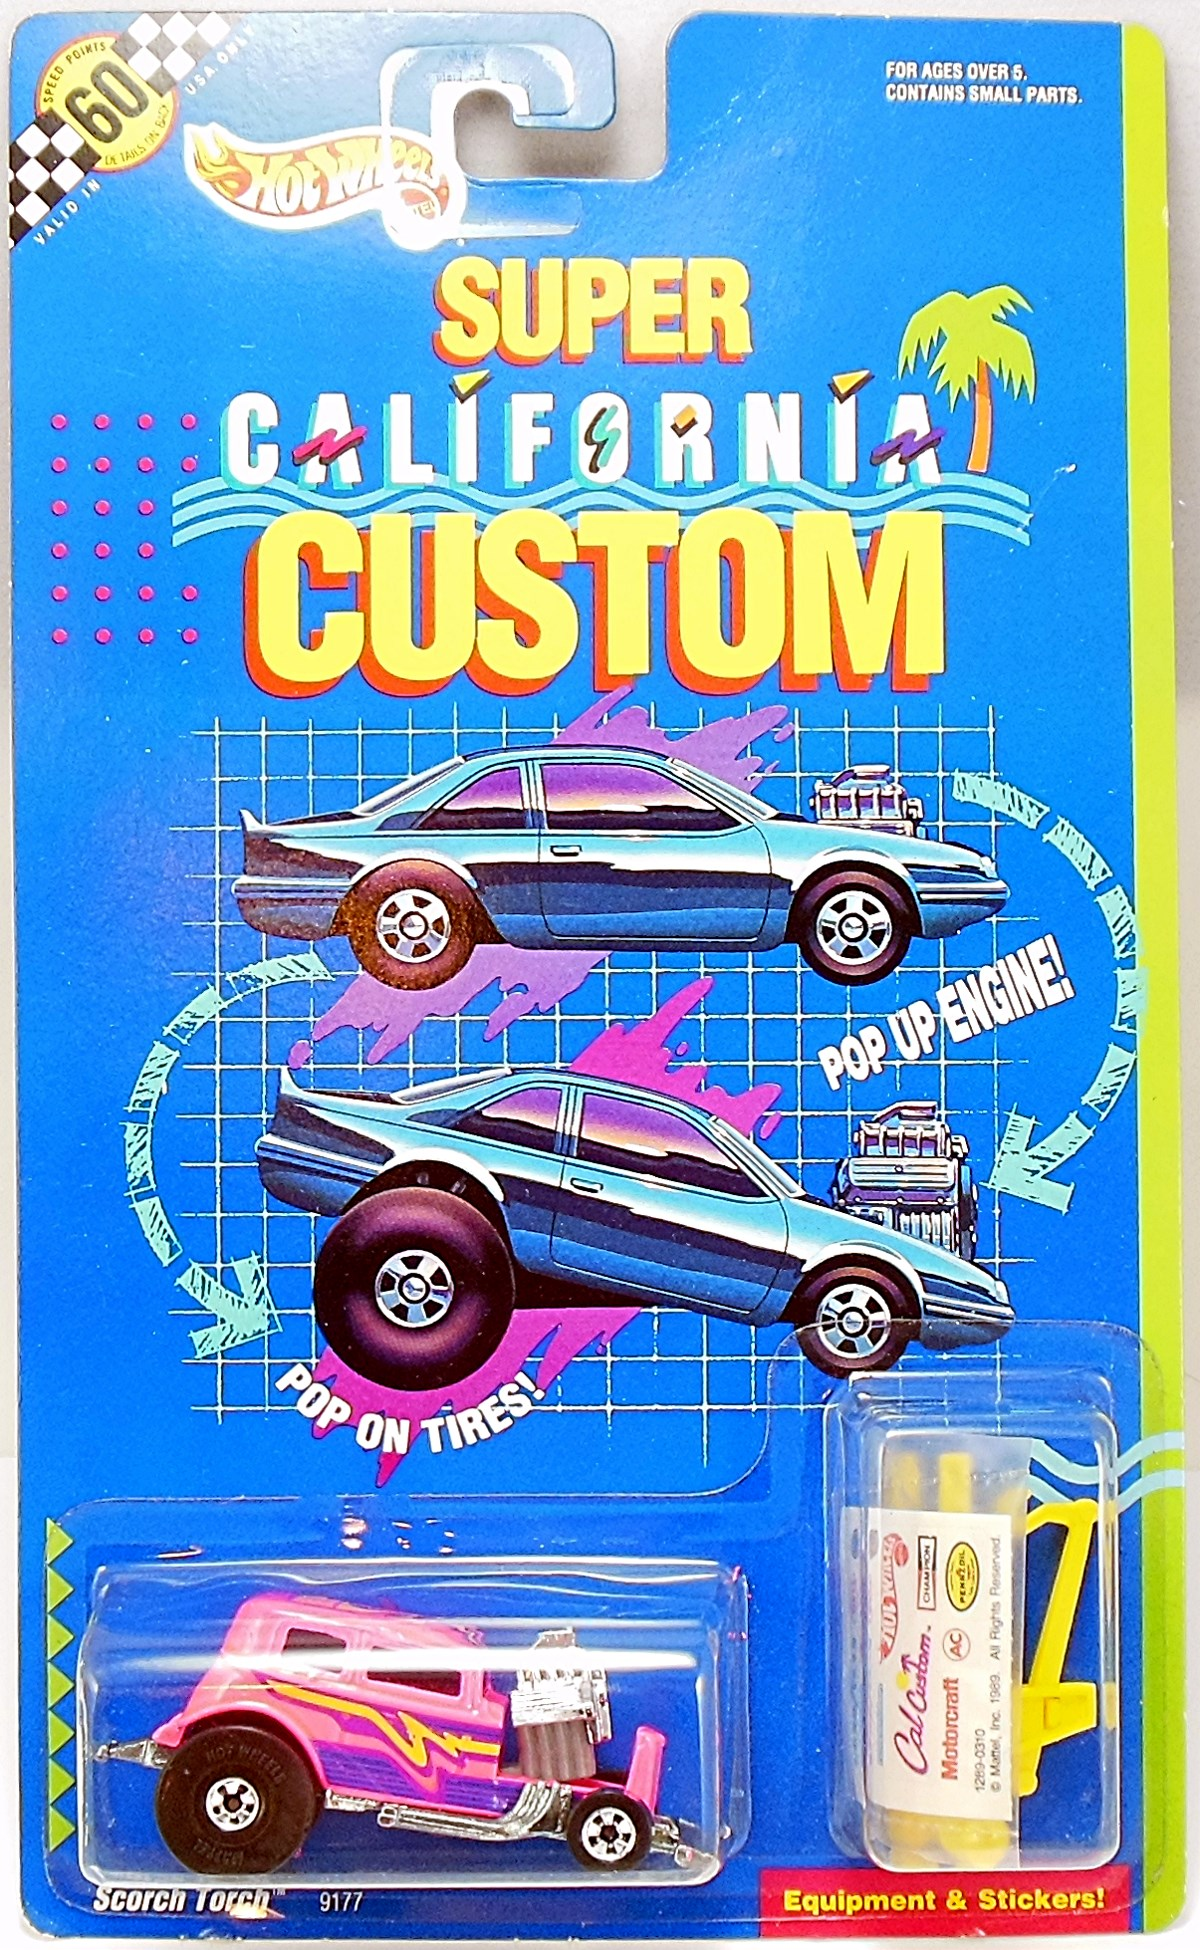 1991 Super California Customs Hot Wheels Newsletter